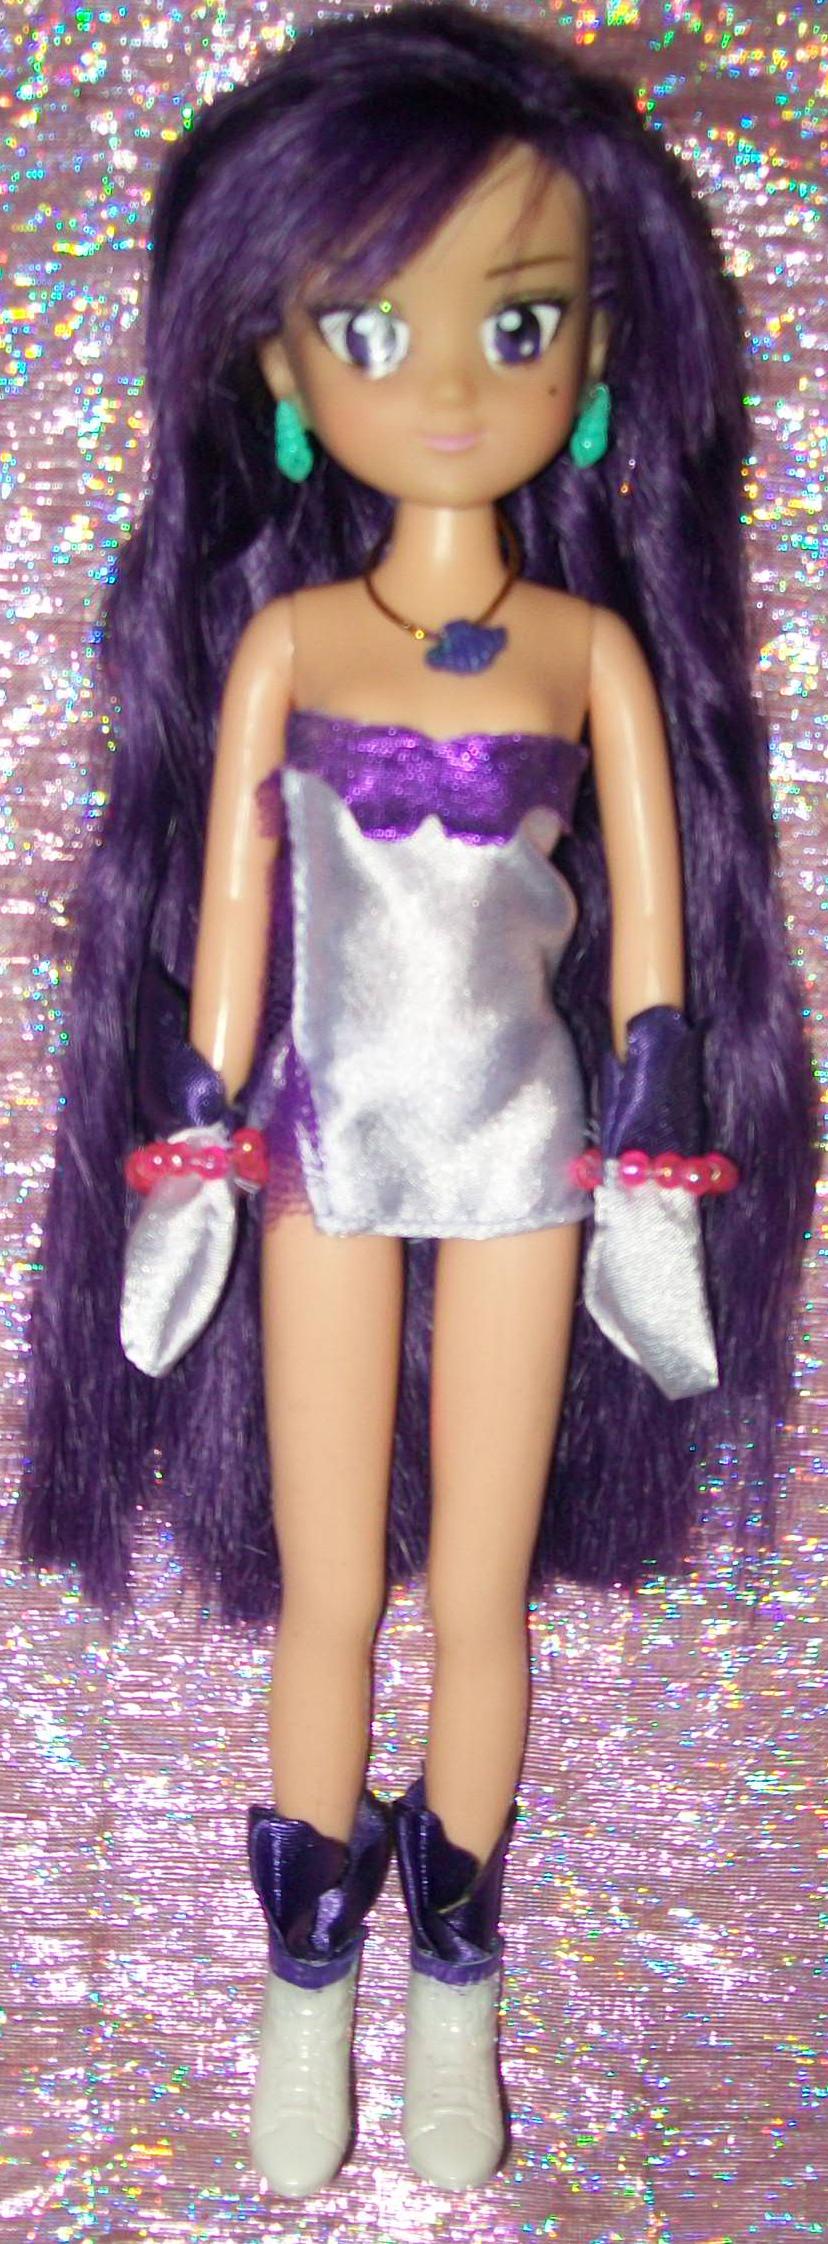 mermaid-melody-bambola-doll-custom-ooak-handmade-caren-idol-bunnytsukino-curemoon